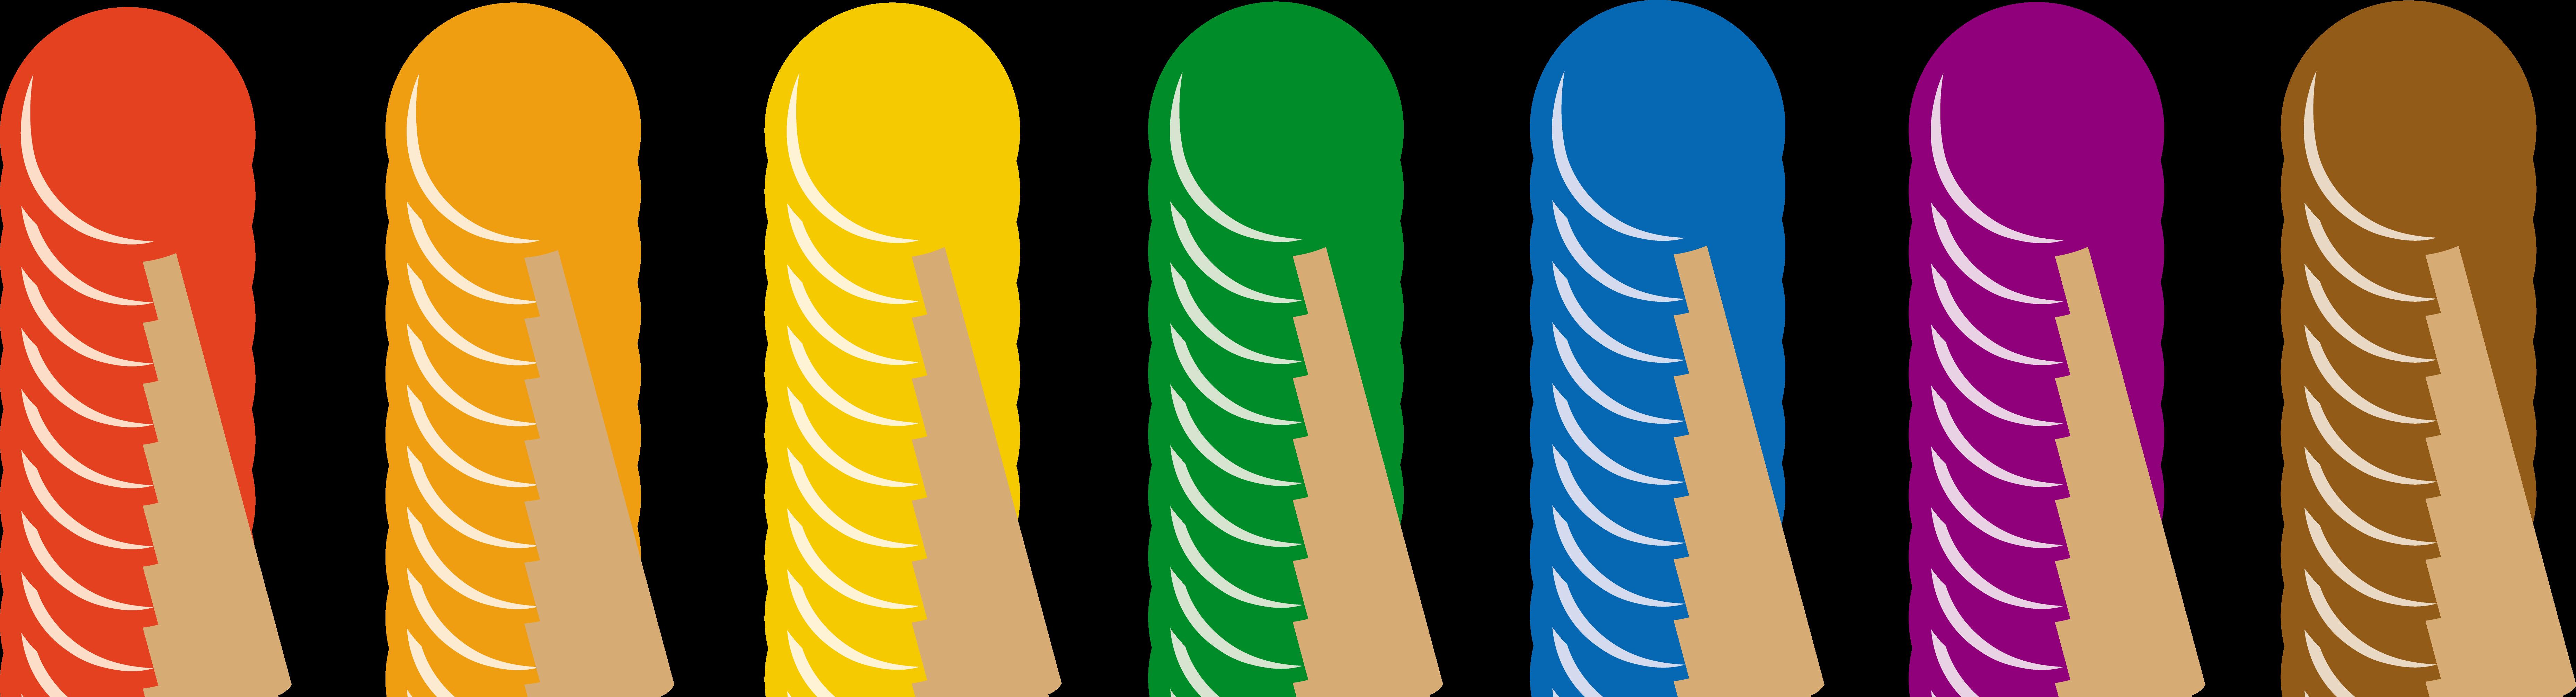 Lollipop clipart seven Sugary Free Lollipops Clip Flavors